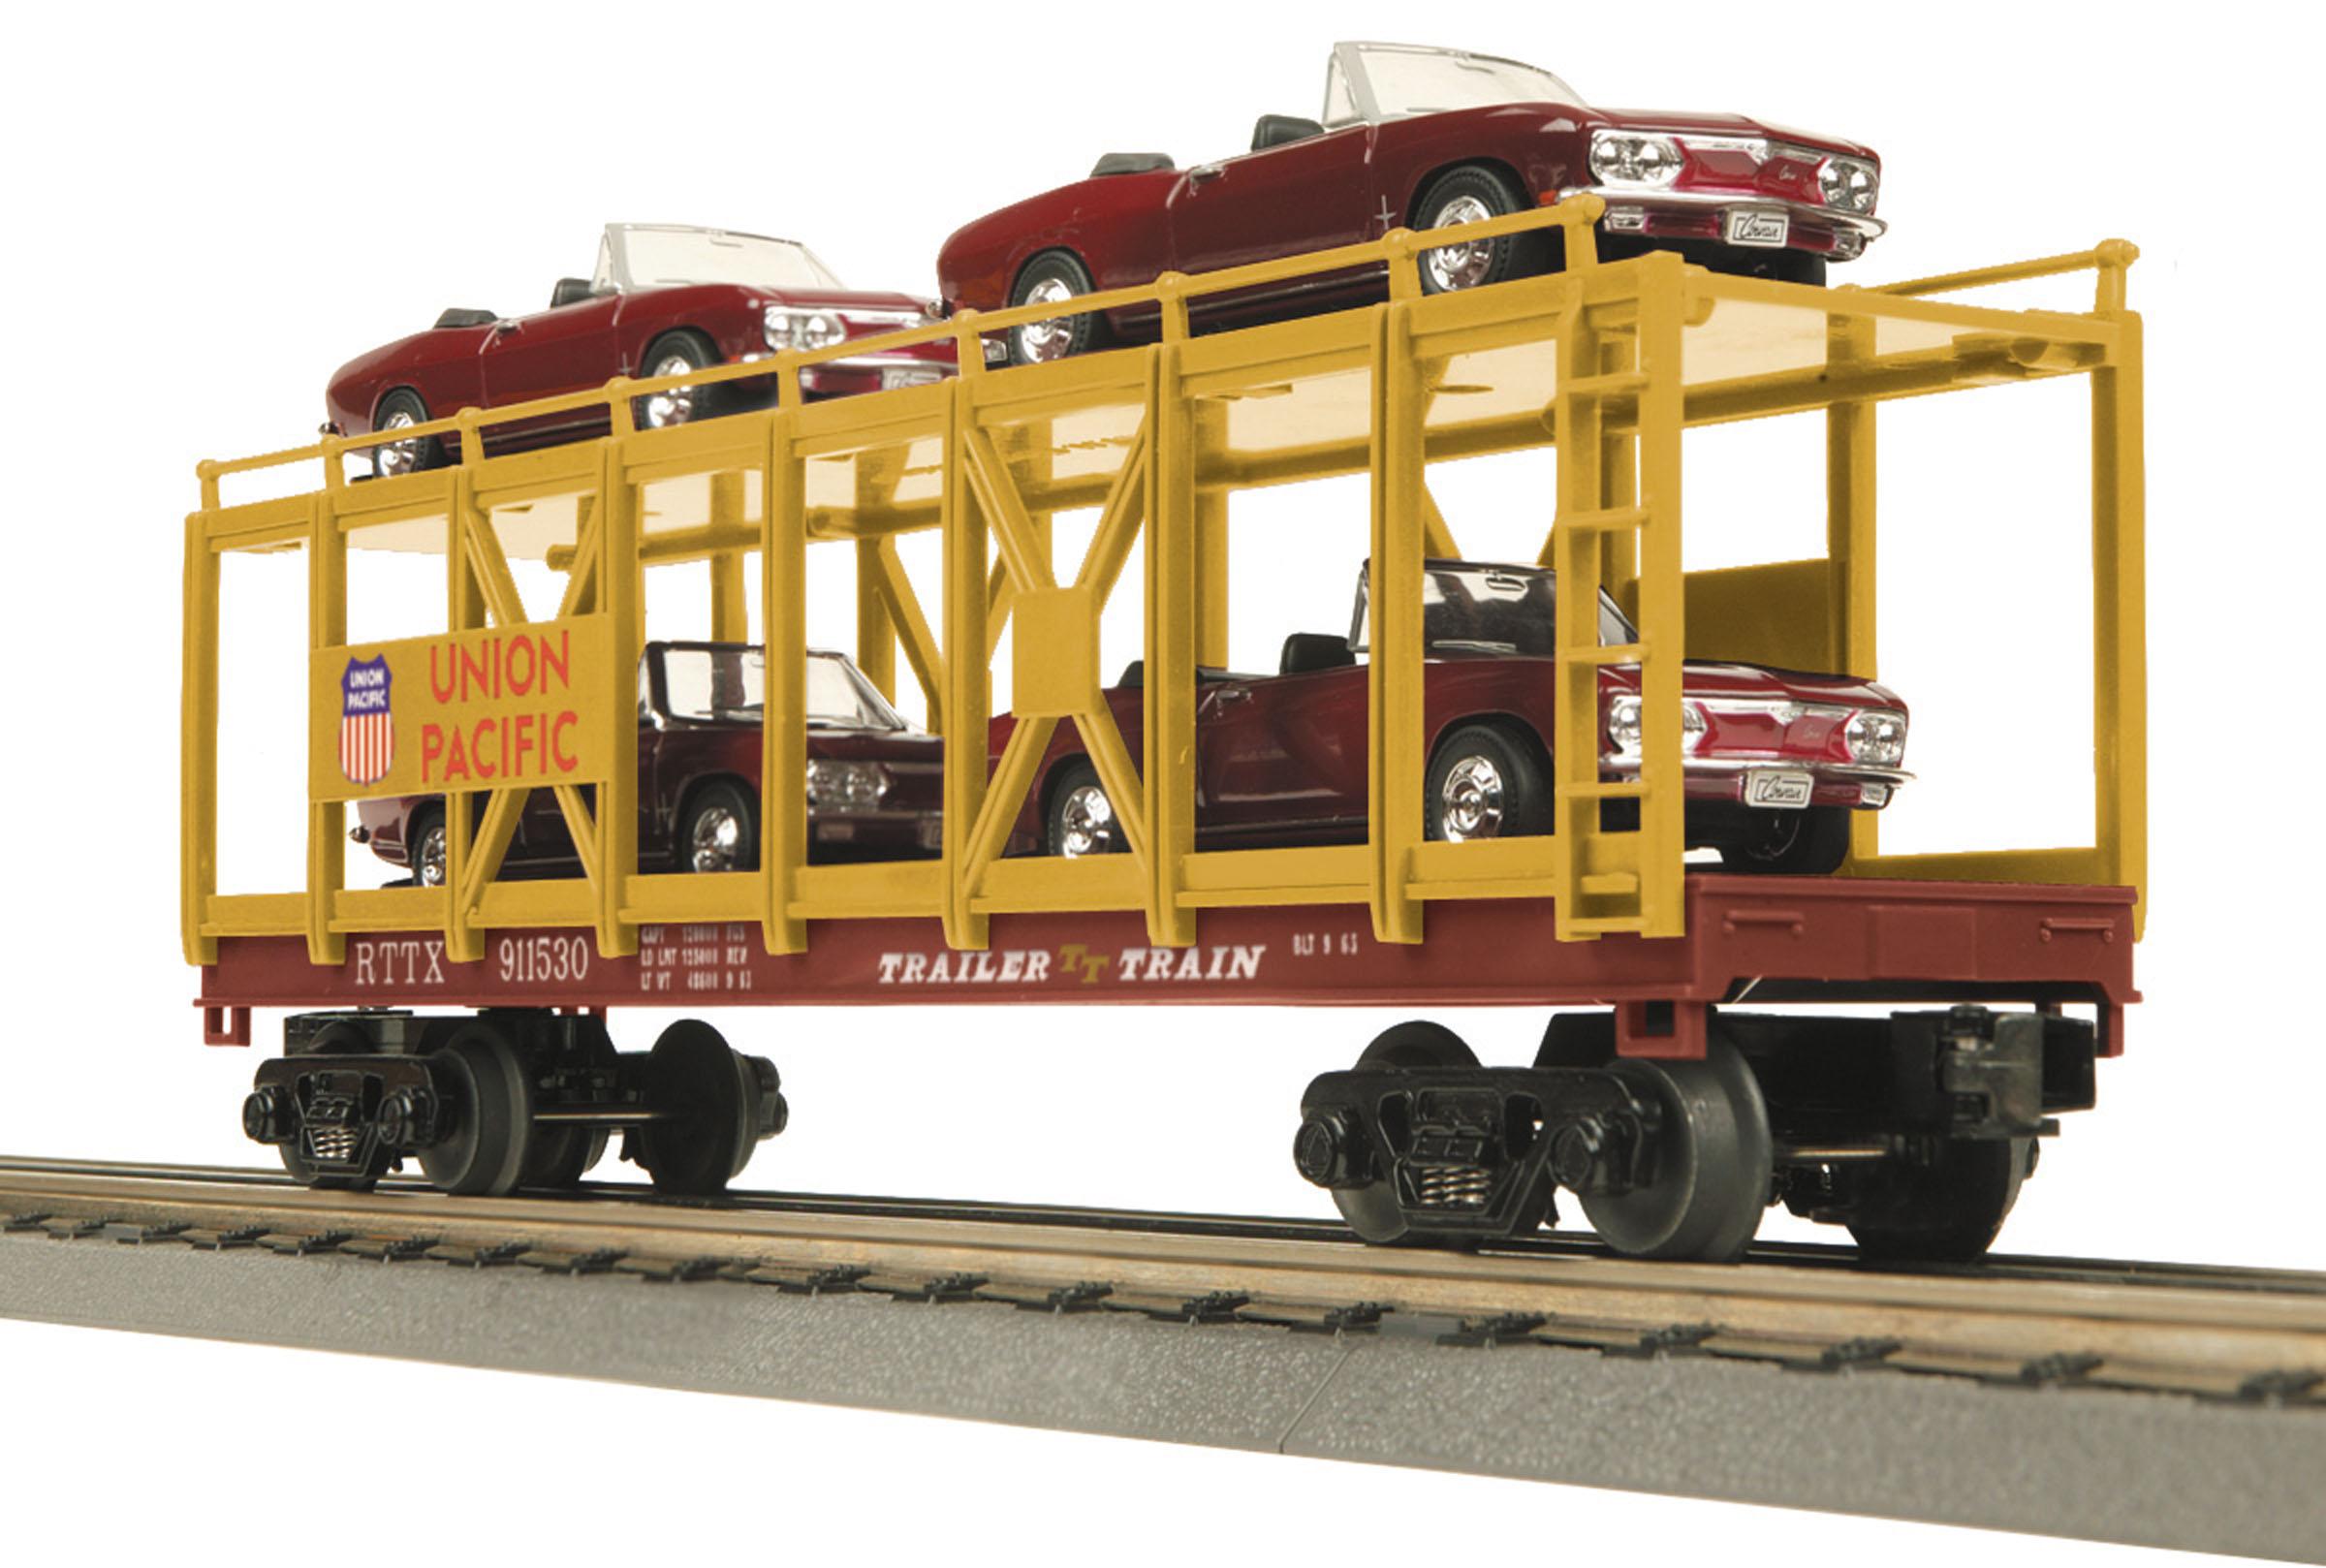 Rail King Union Pacific Flatcar w//Trailer #30-7632 O scale